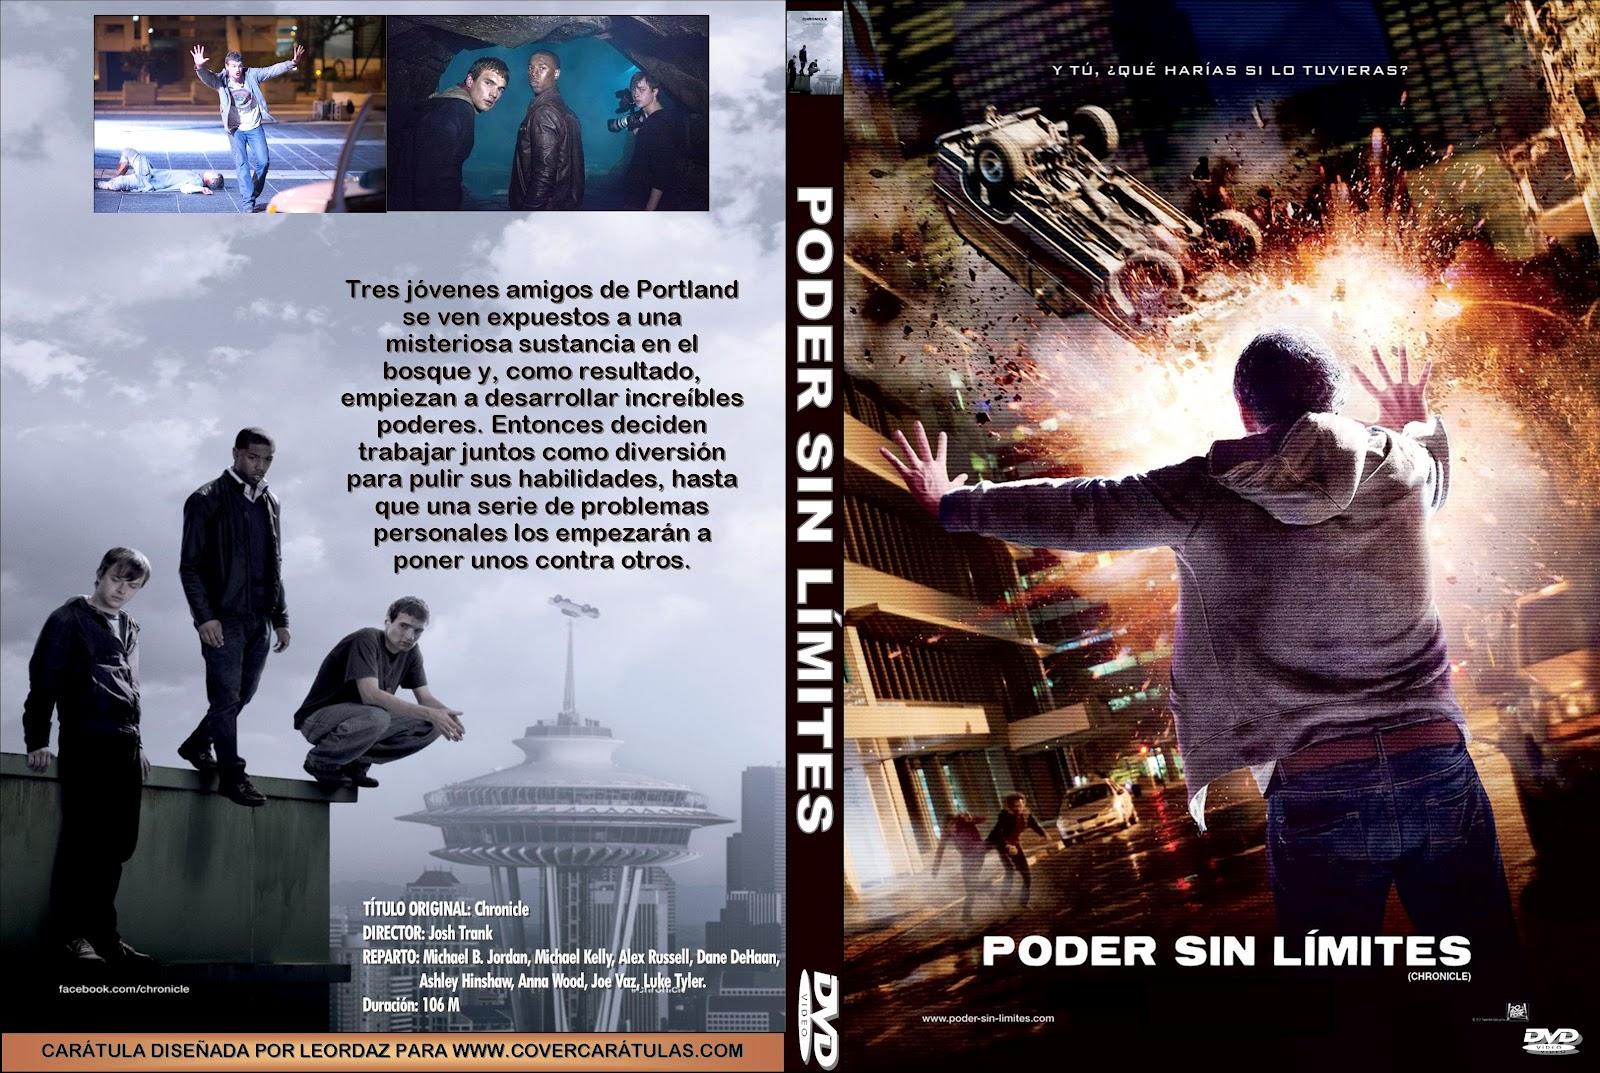 http://3.bp.blogspot.com/-tzzEJH_5TDQ/T58kTW1EDVI/AAAAAAAACC4/DPj3rAiy2rA/s1600/Poder+Sin+Limites+Custom+V2+Por+Leordaz+-+dvd.jpg